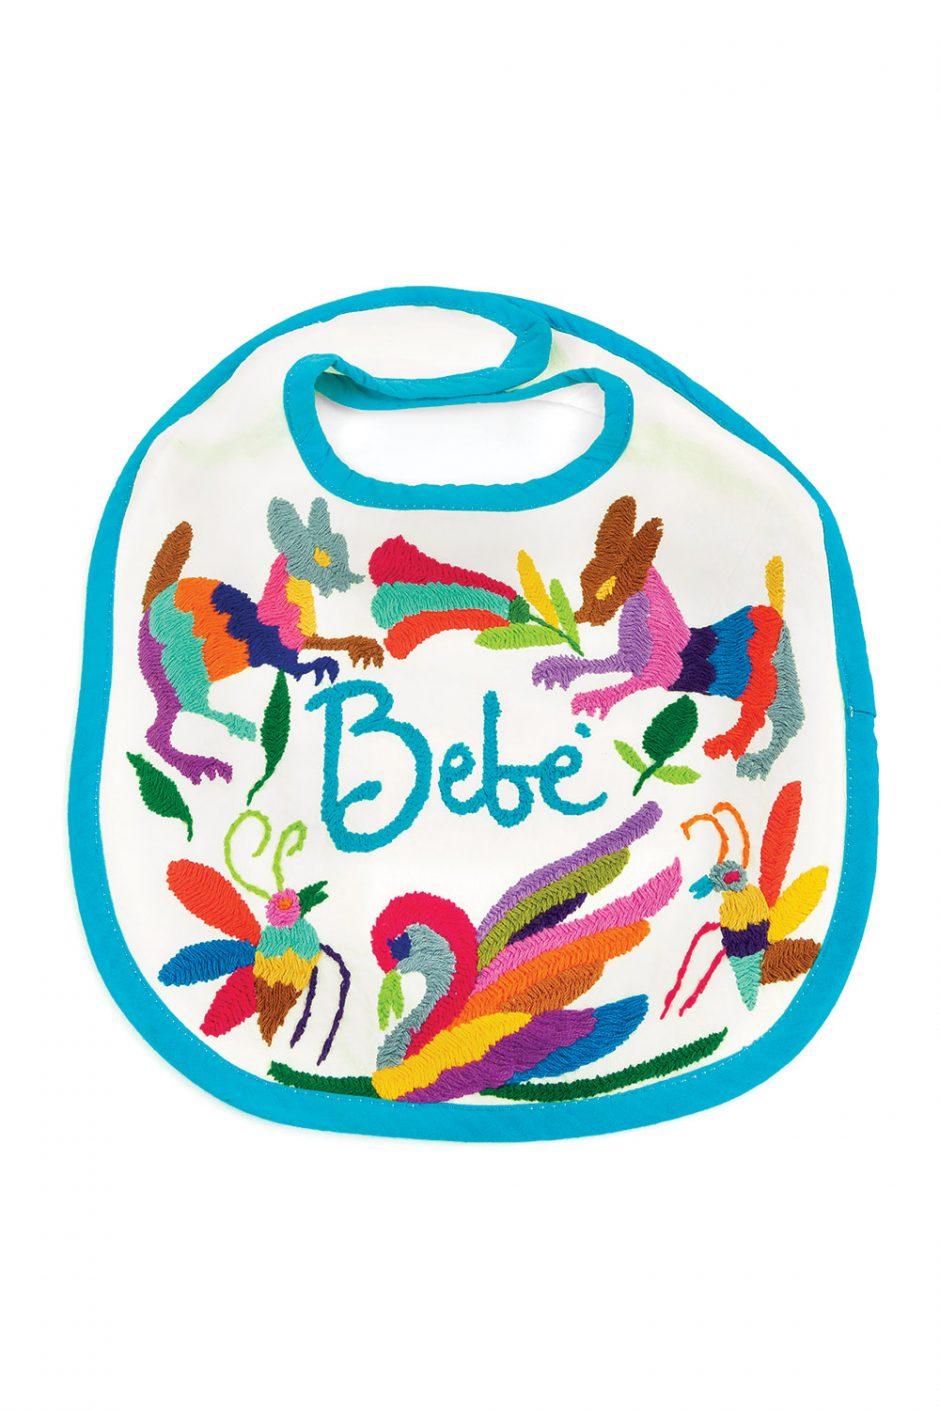 Nativa hand-embroidered artisan bib